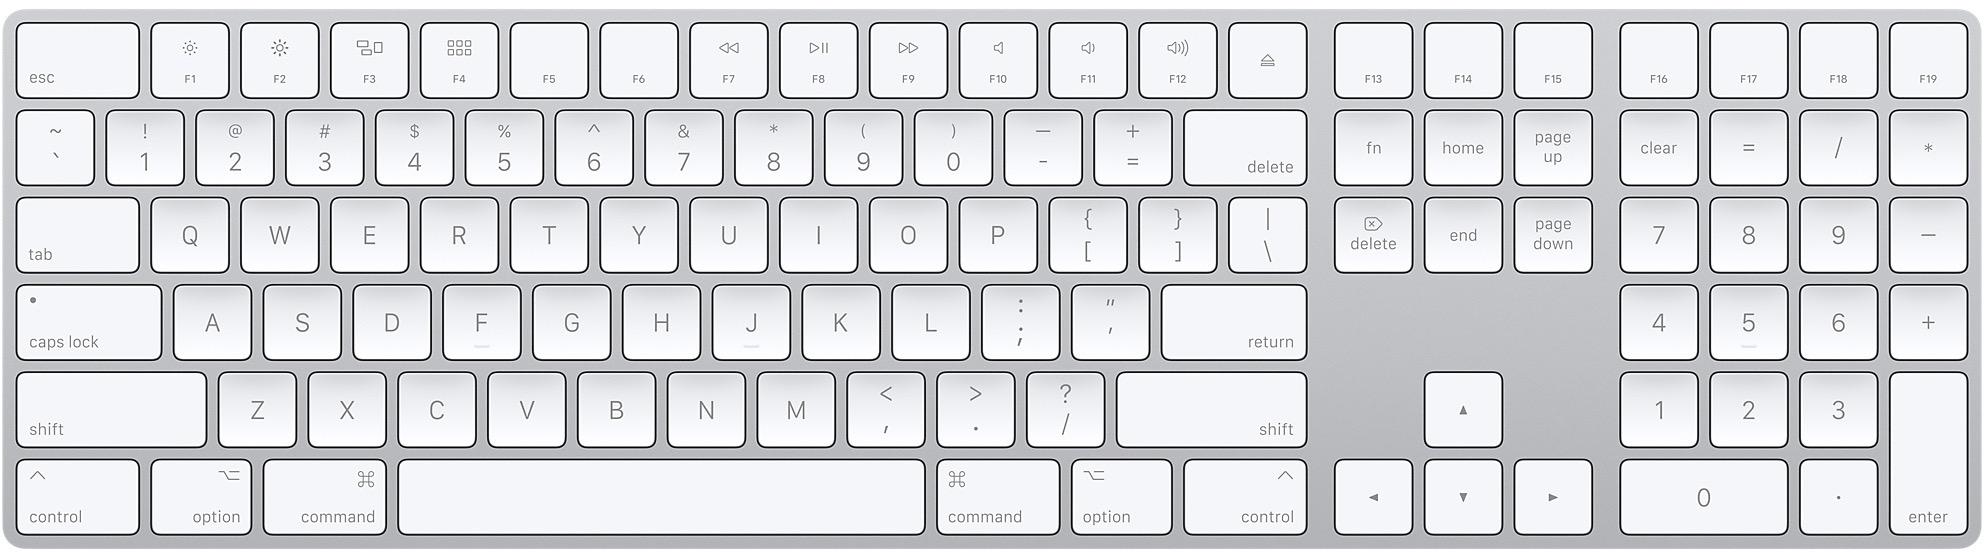 Magic Keyboard com teclado numérico